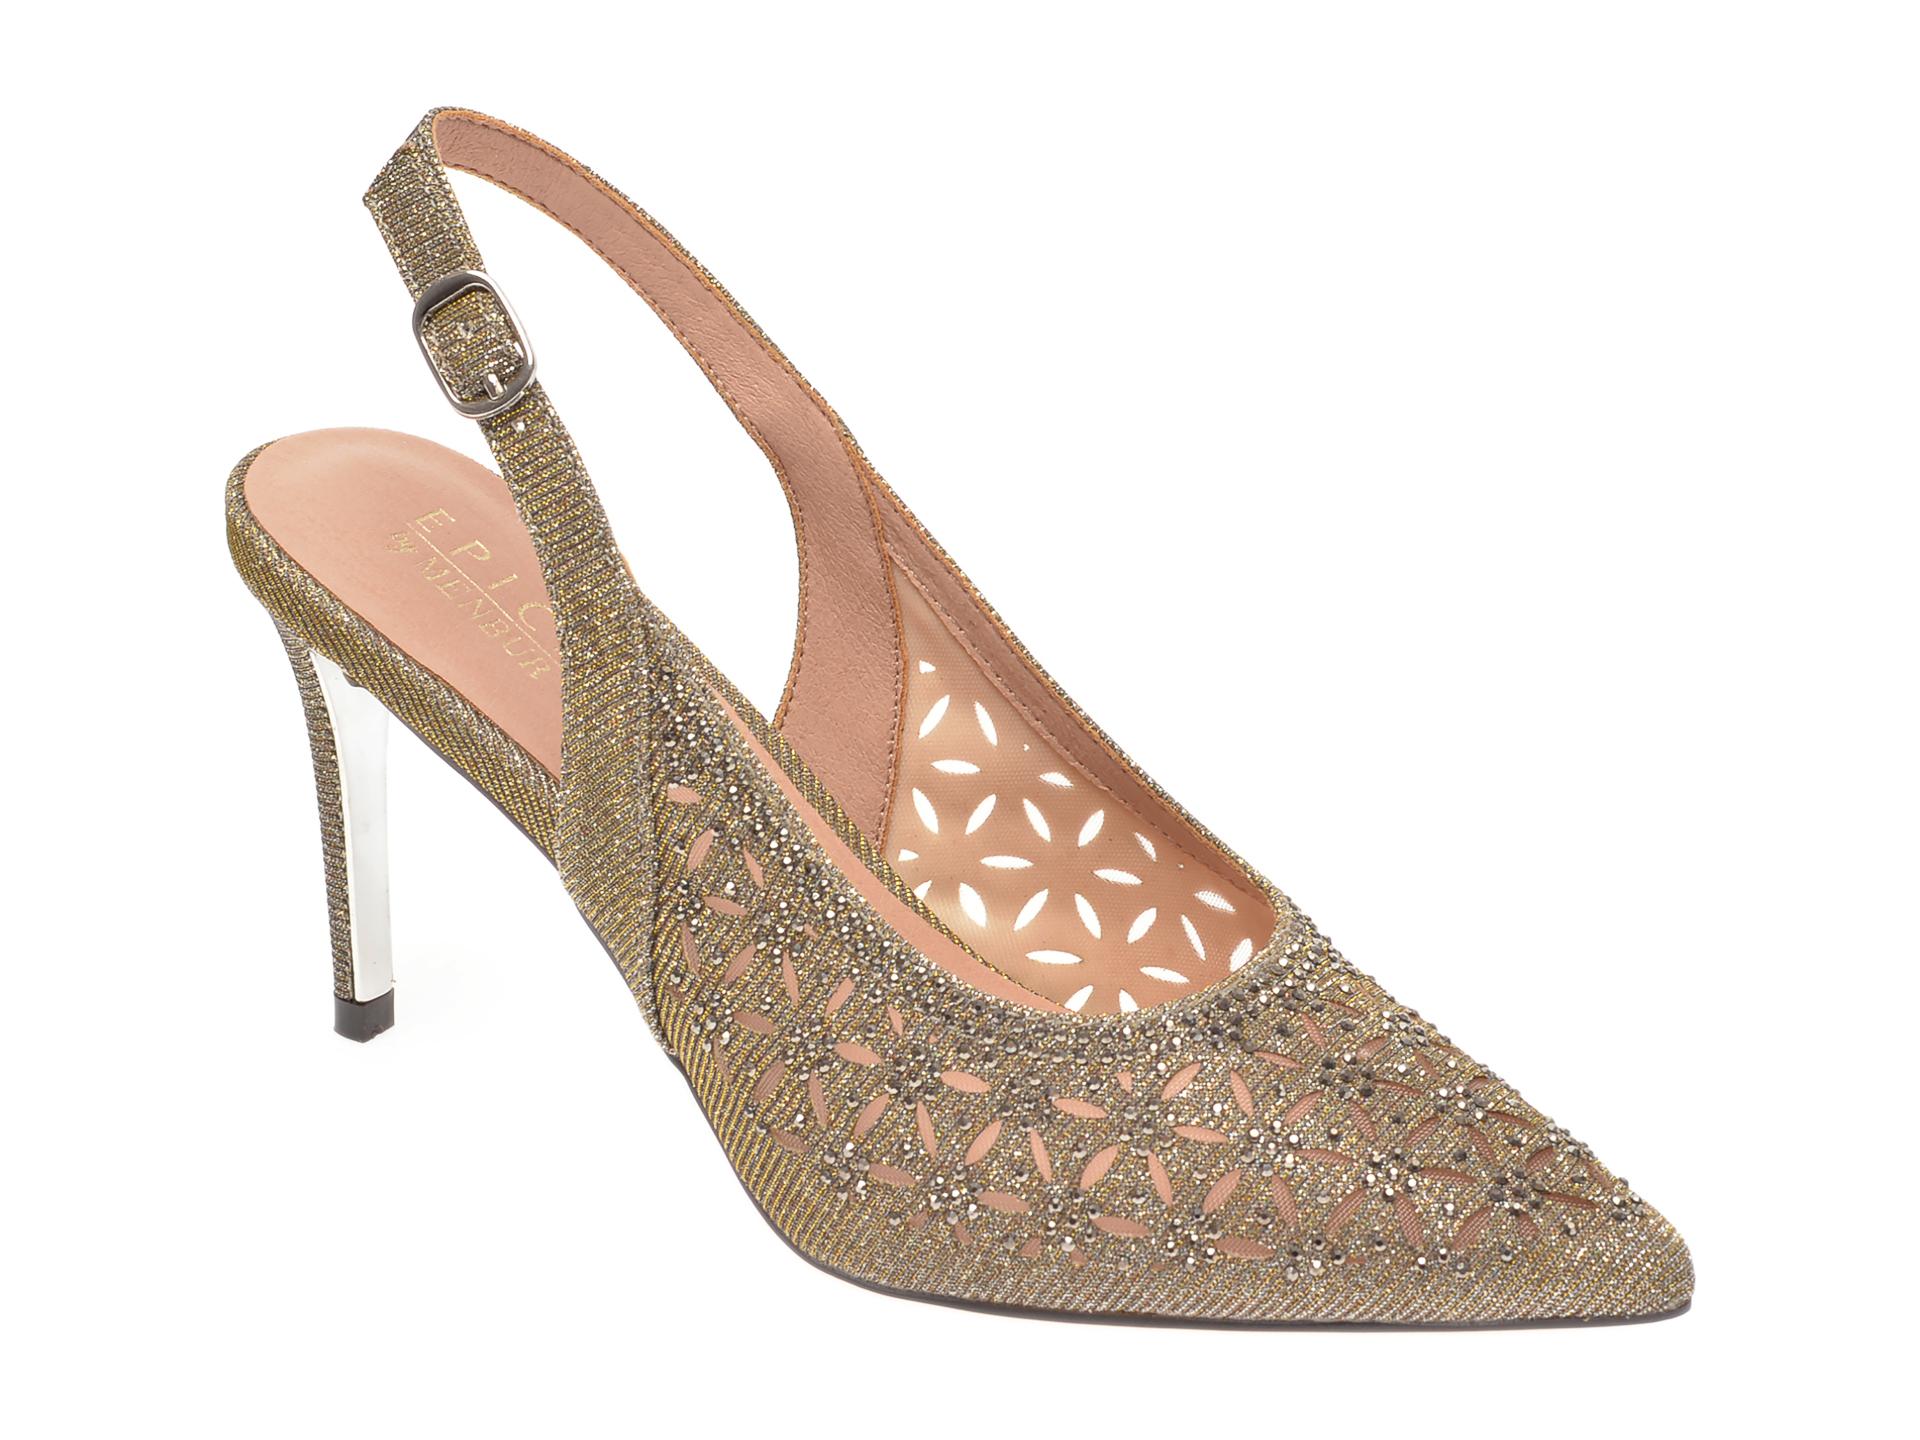 /femei/pantofi Dama/pantofi Eleganti Dama